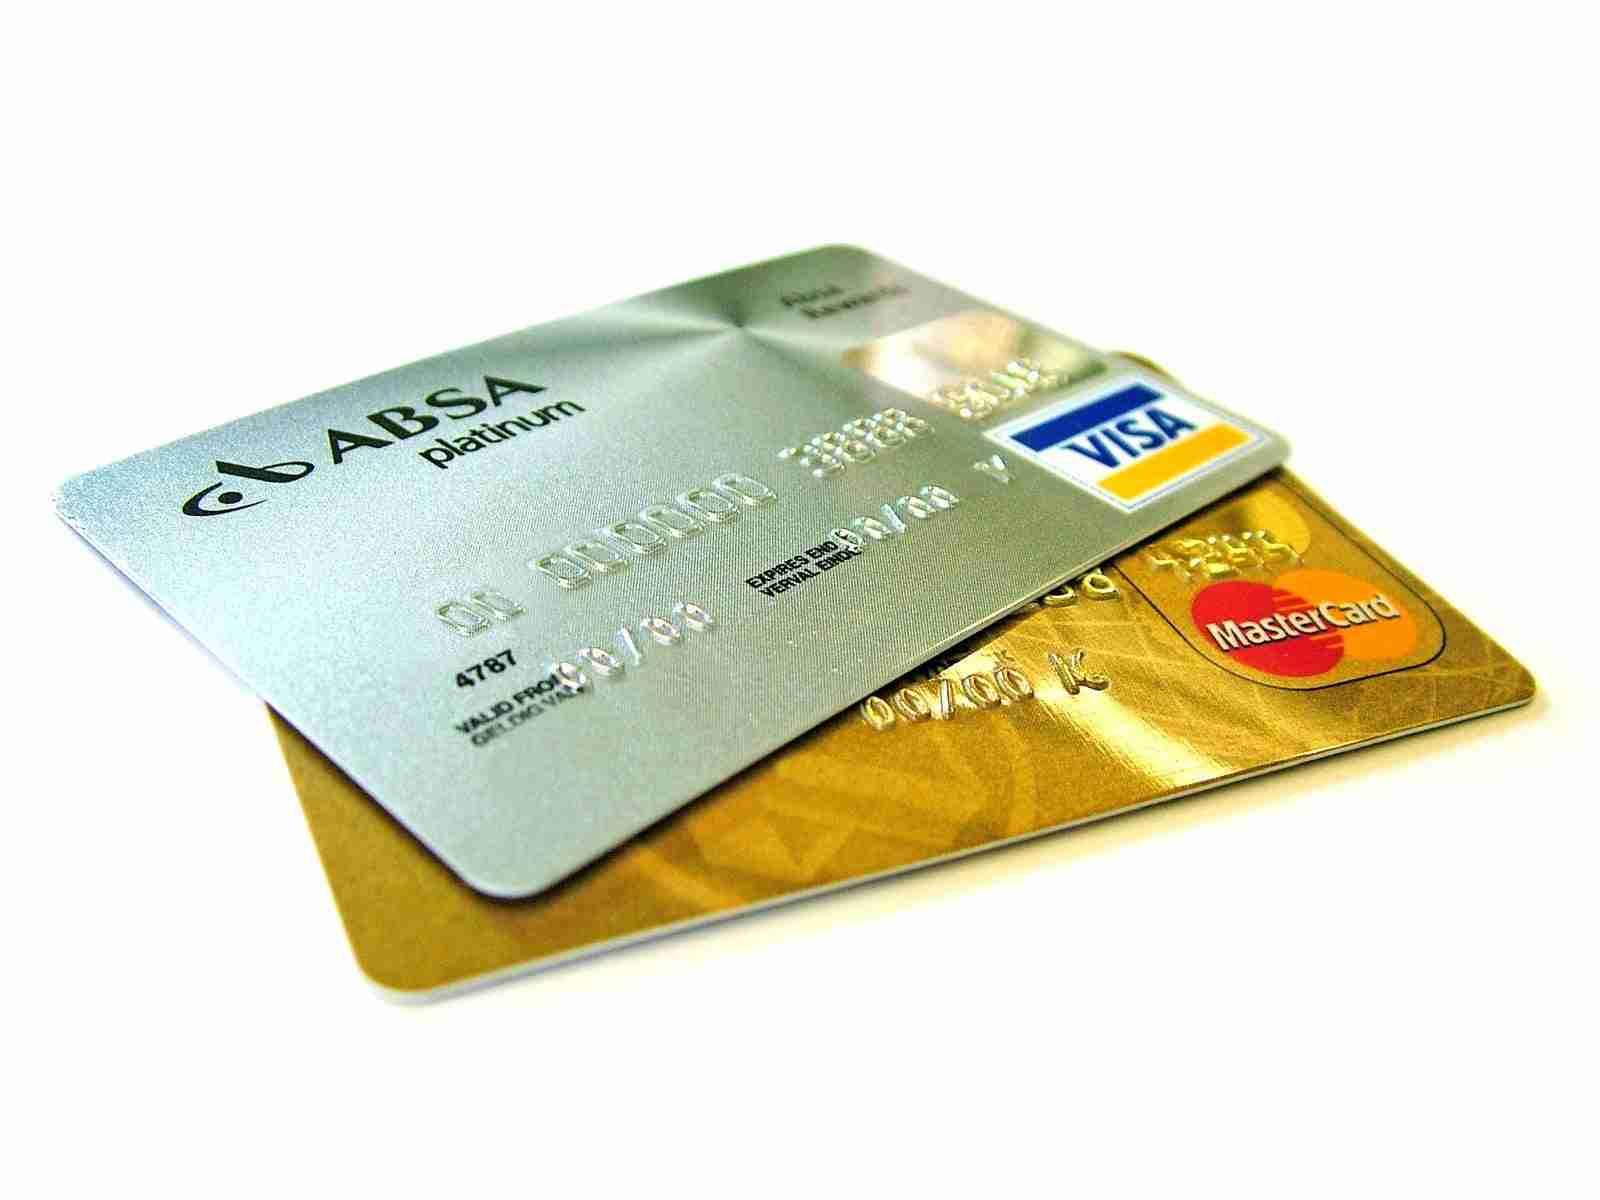 2500 credit card